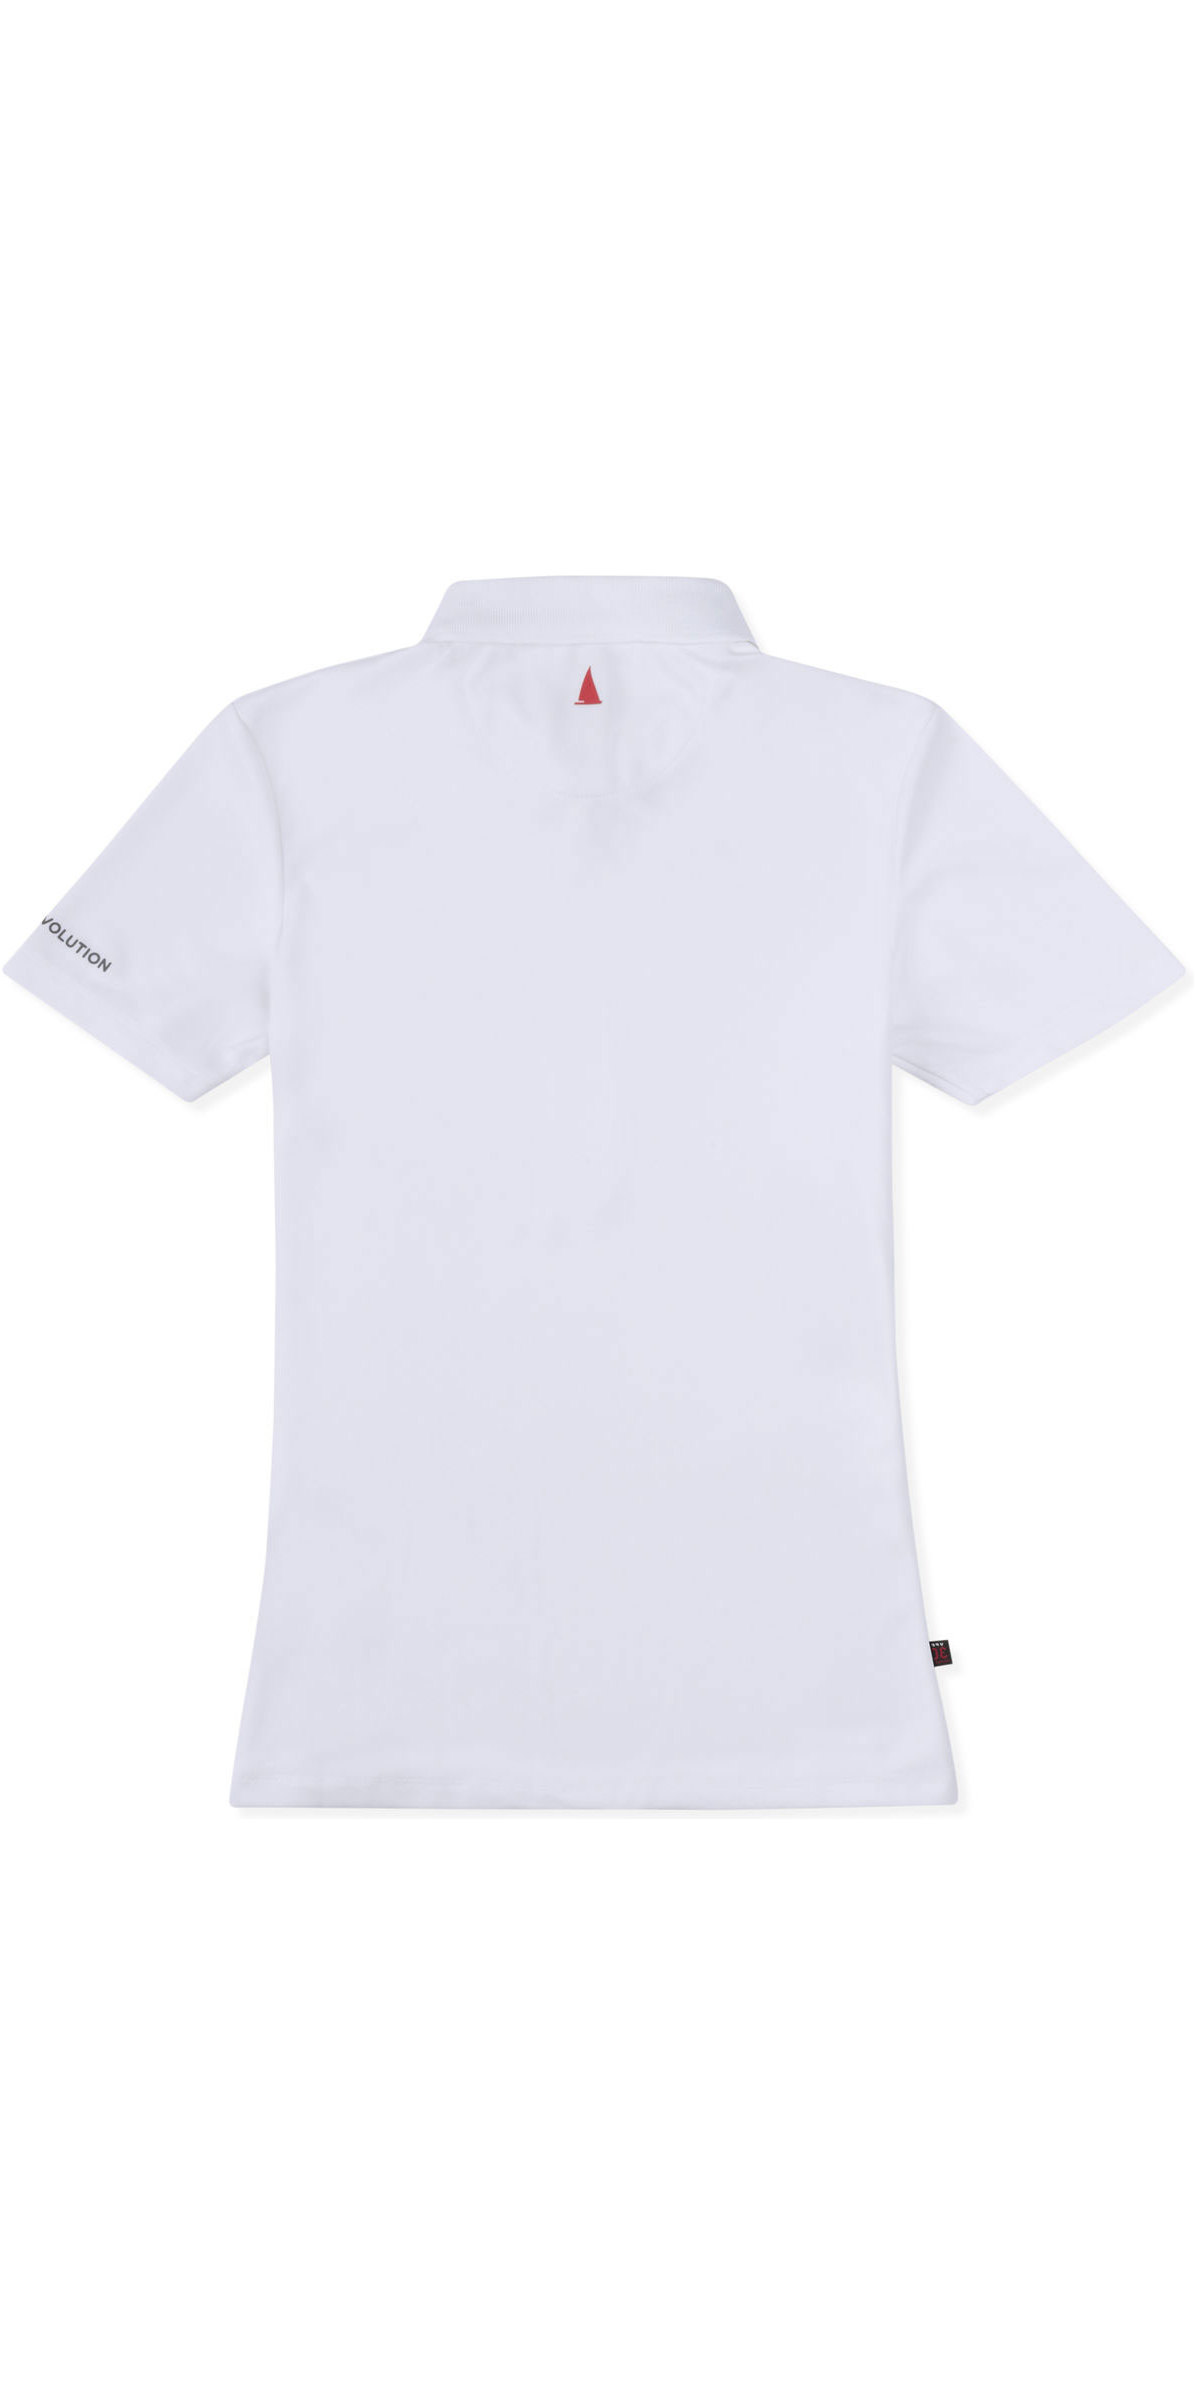 2019 Musto Womens SunShield Permanent Wicking UPF30 Polo White EWPS011